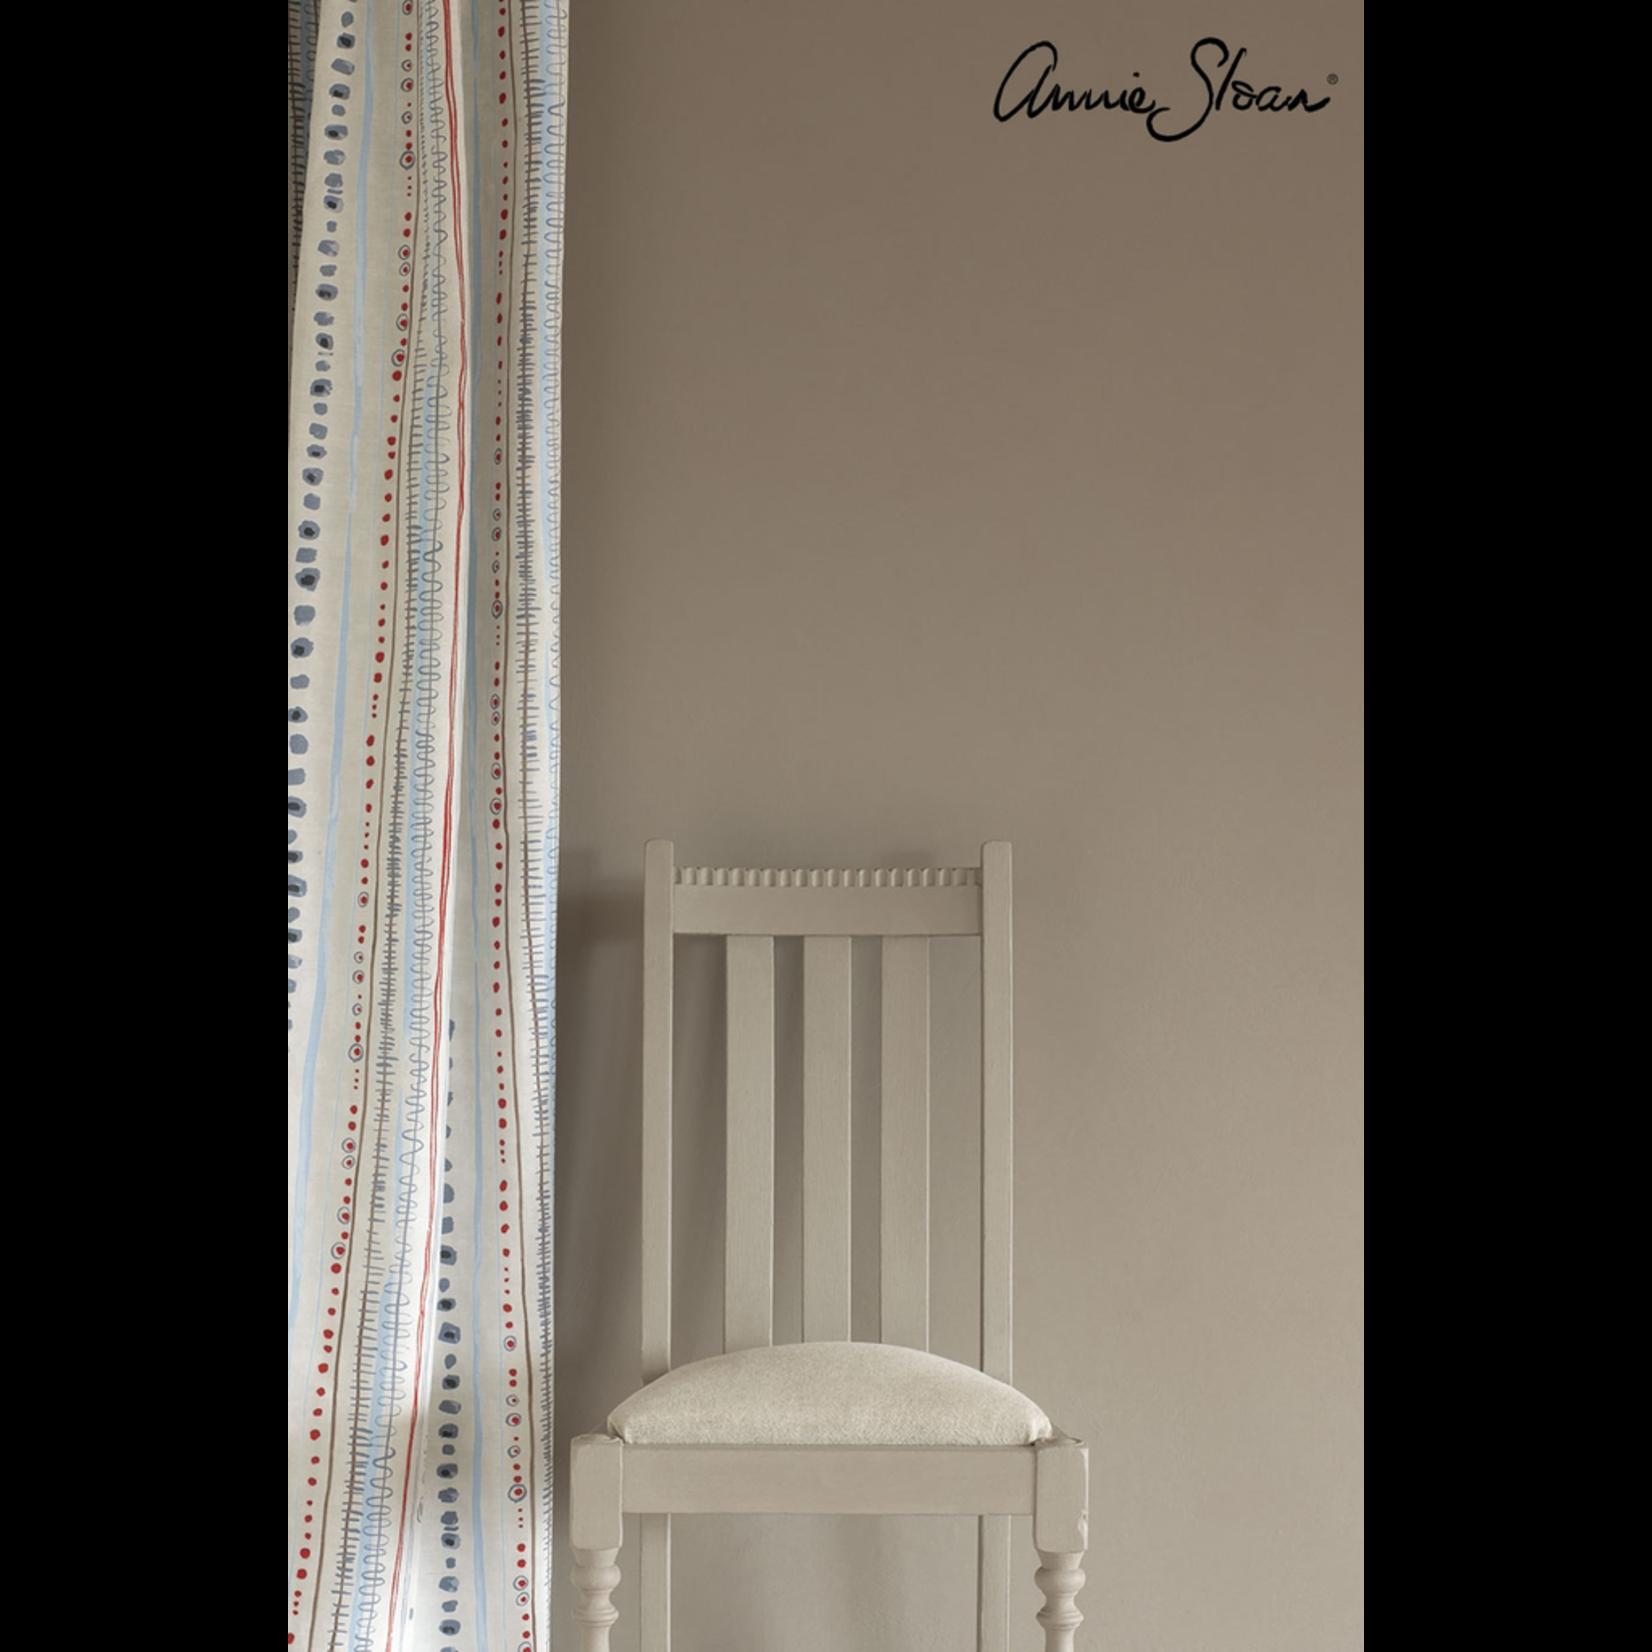 Annie Sloan Annie Sloan French Linen wall paint